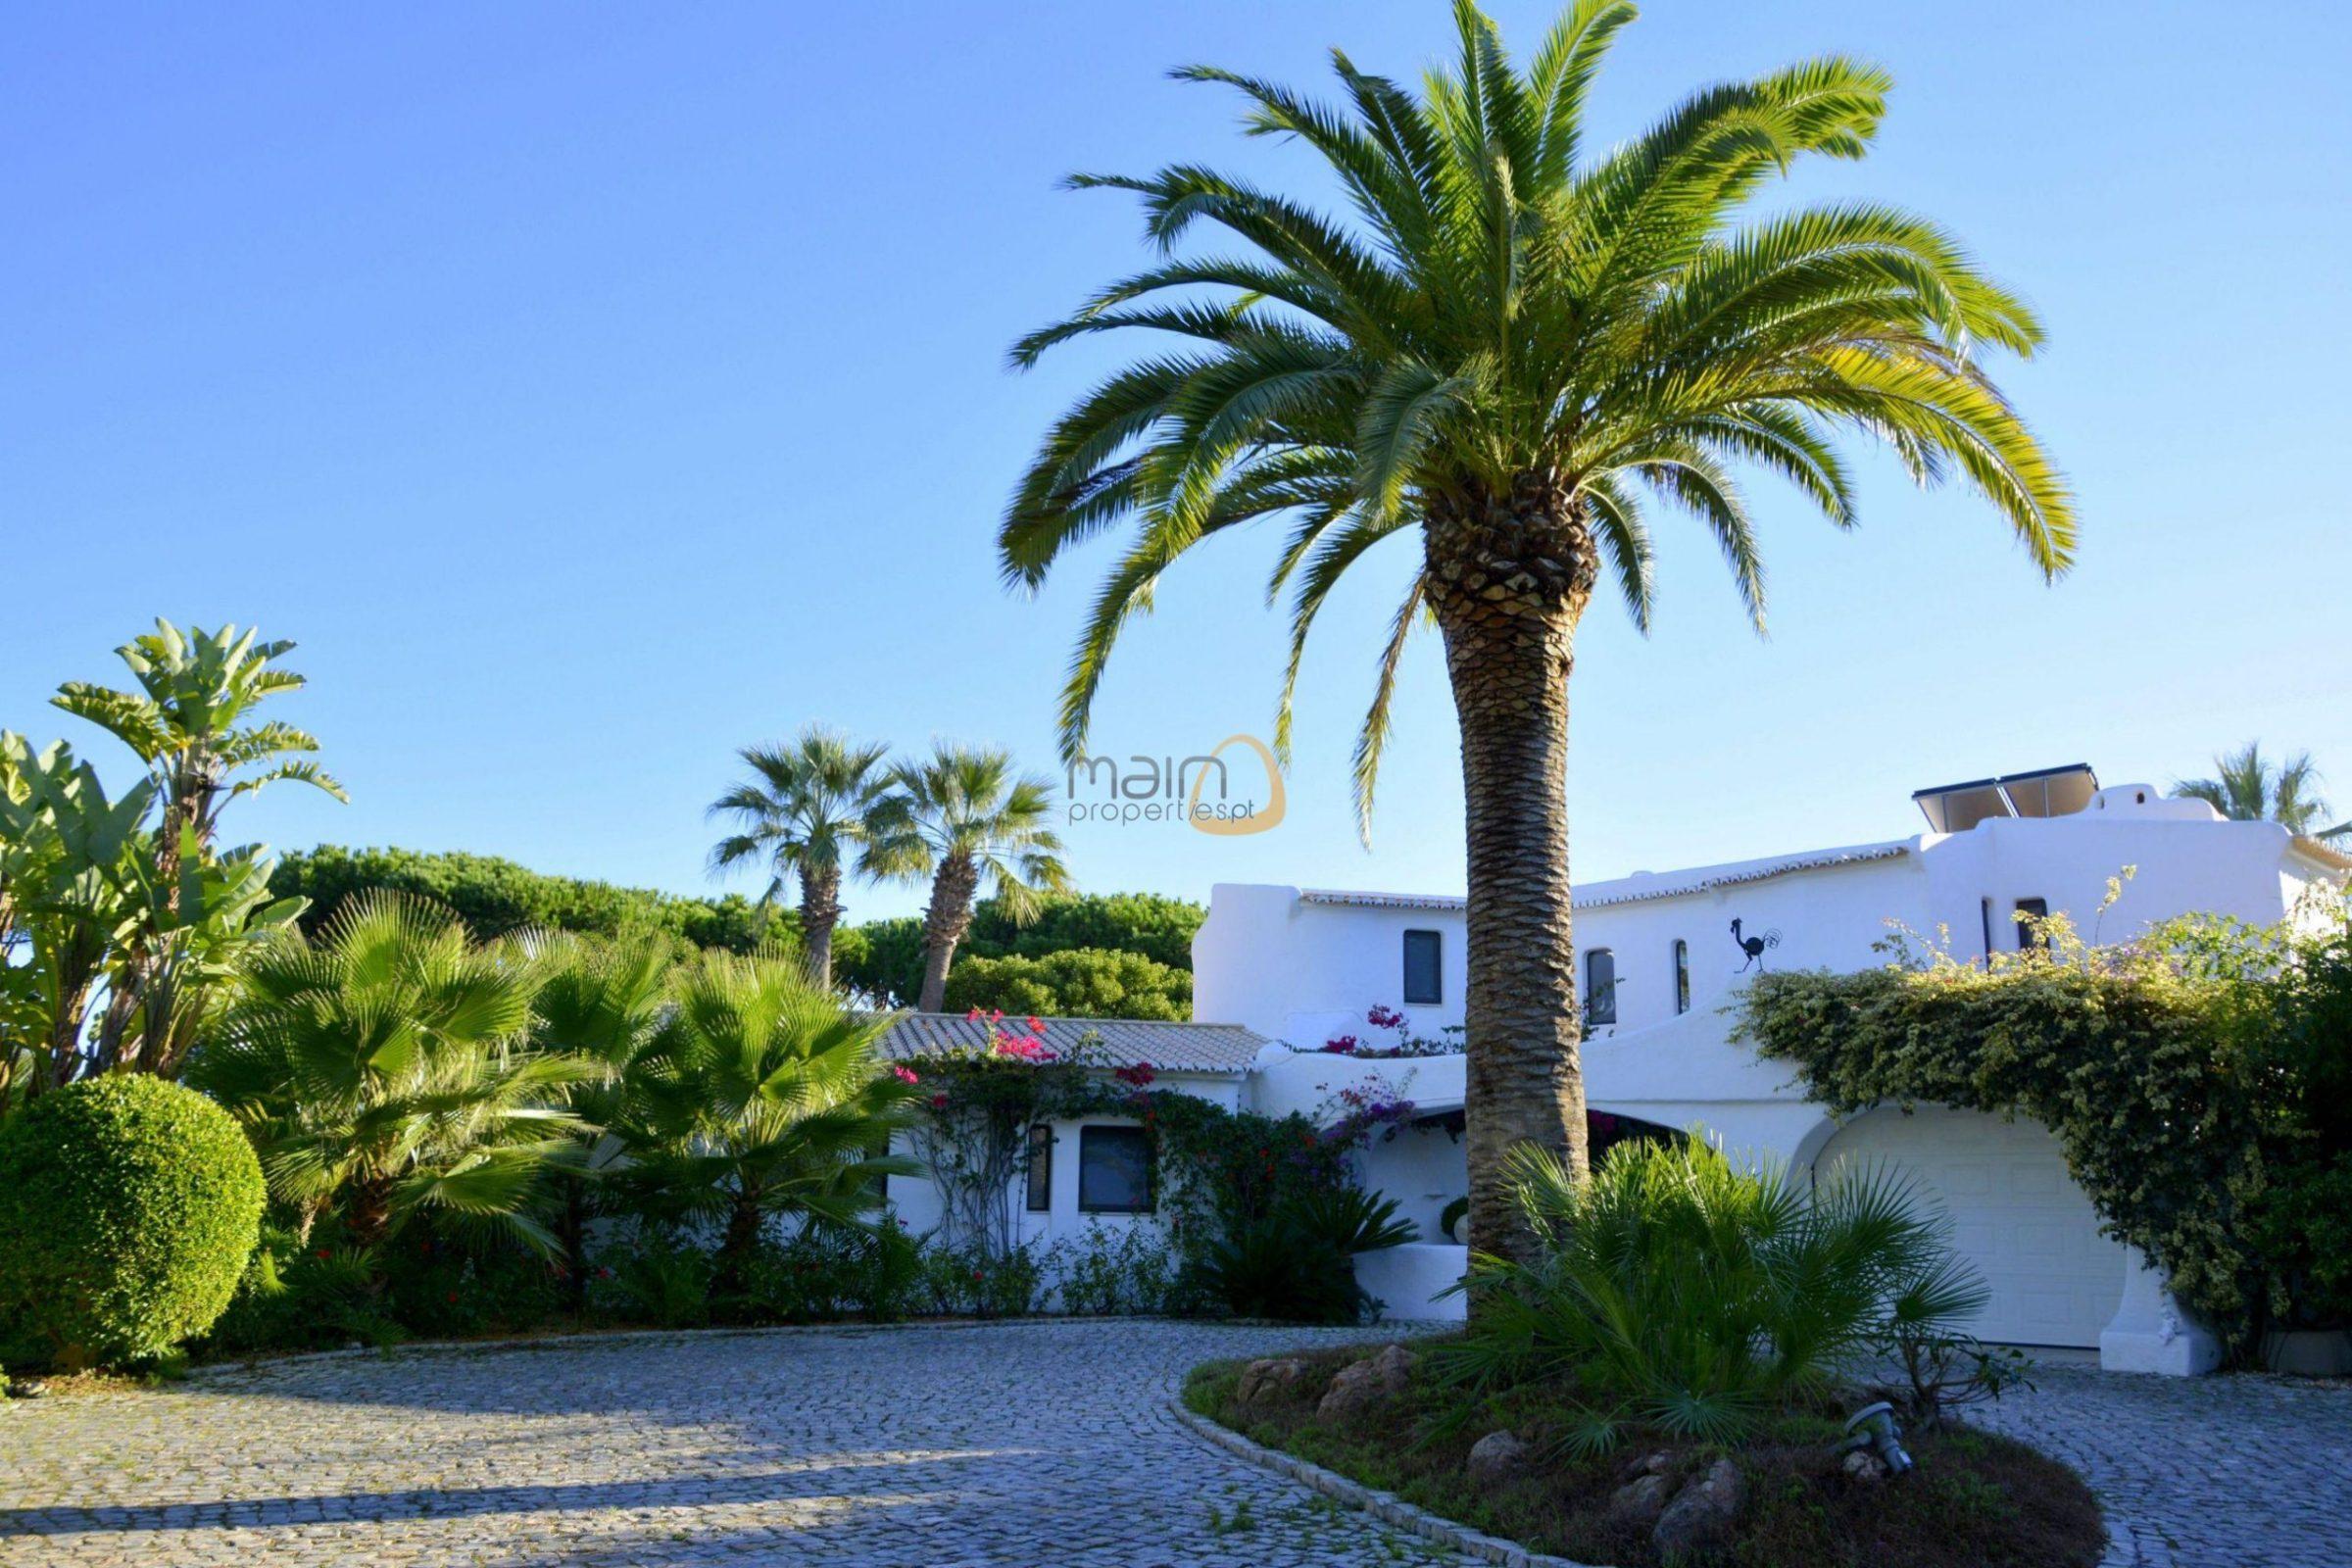 [:pt]Moradia com 5 quartos na Quinta do Lago :: Entrada :: MainProperties :: 020061[:en]villa-quinta-do-lago-algarve-portugal-020061-12[:]